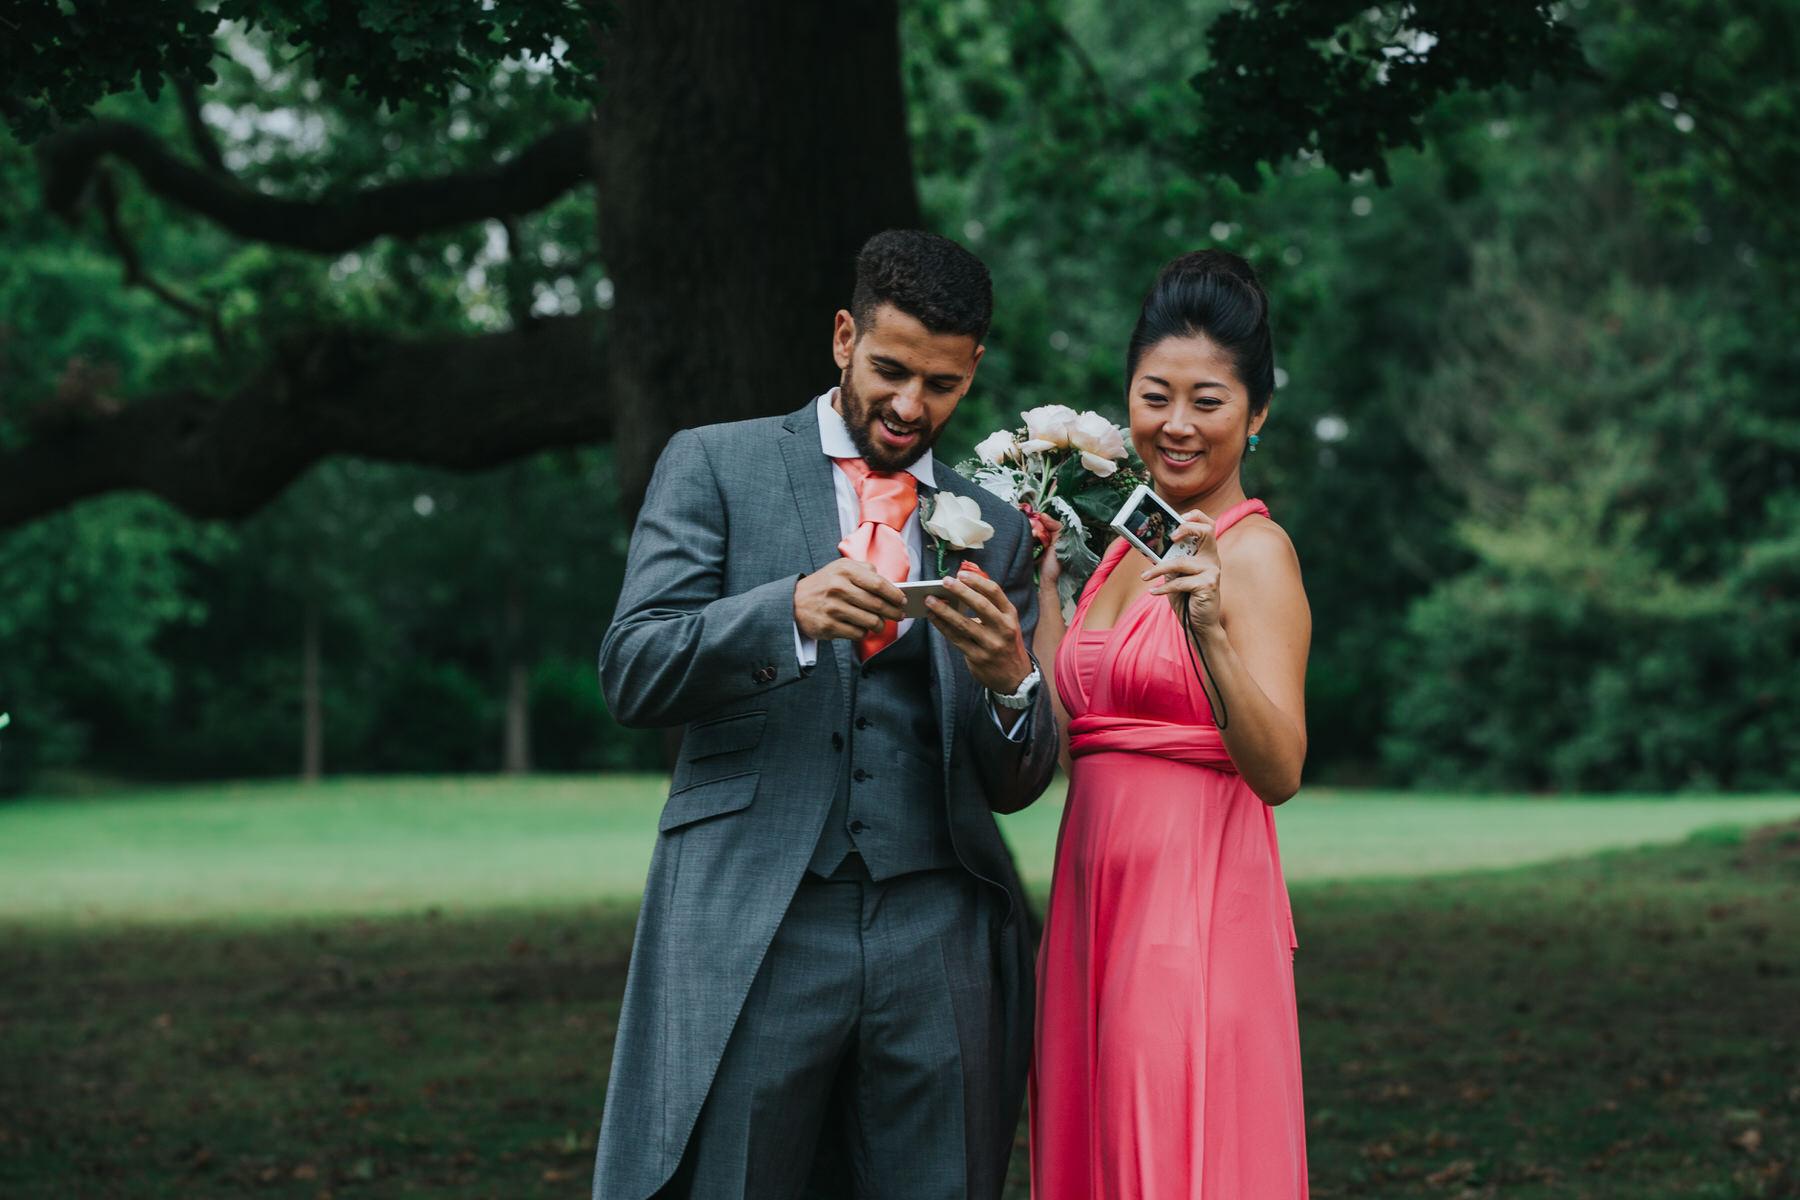 359 usher bridesmaid selfie reportage wedding photographer.jpg